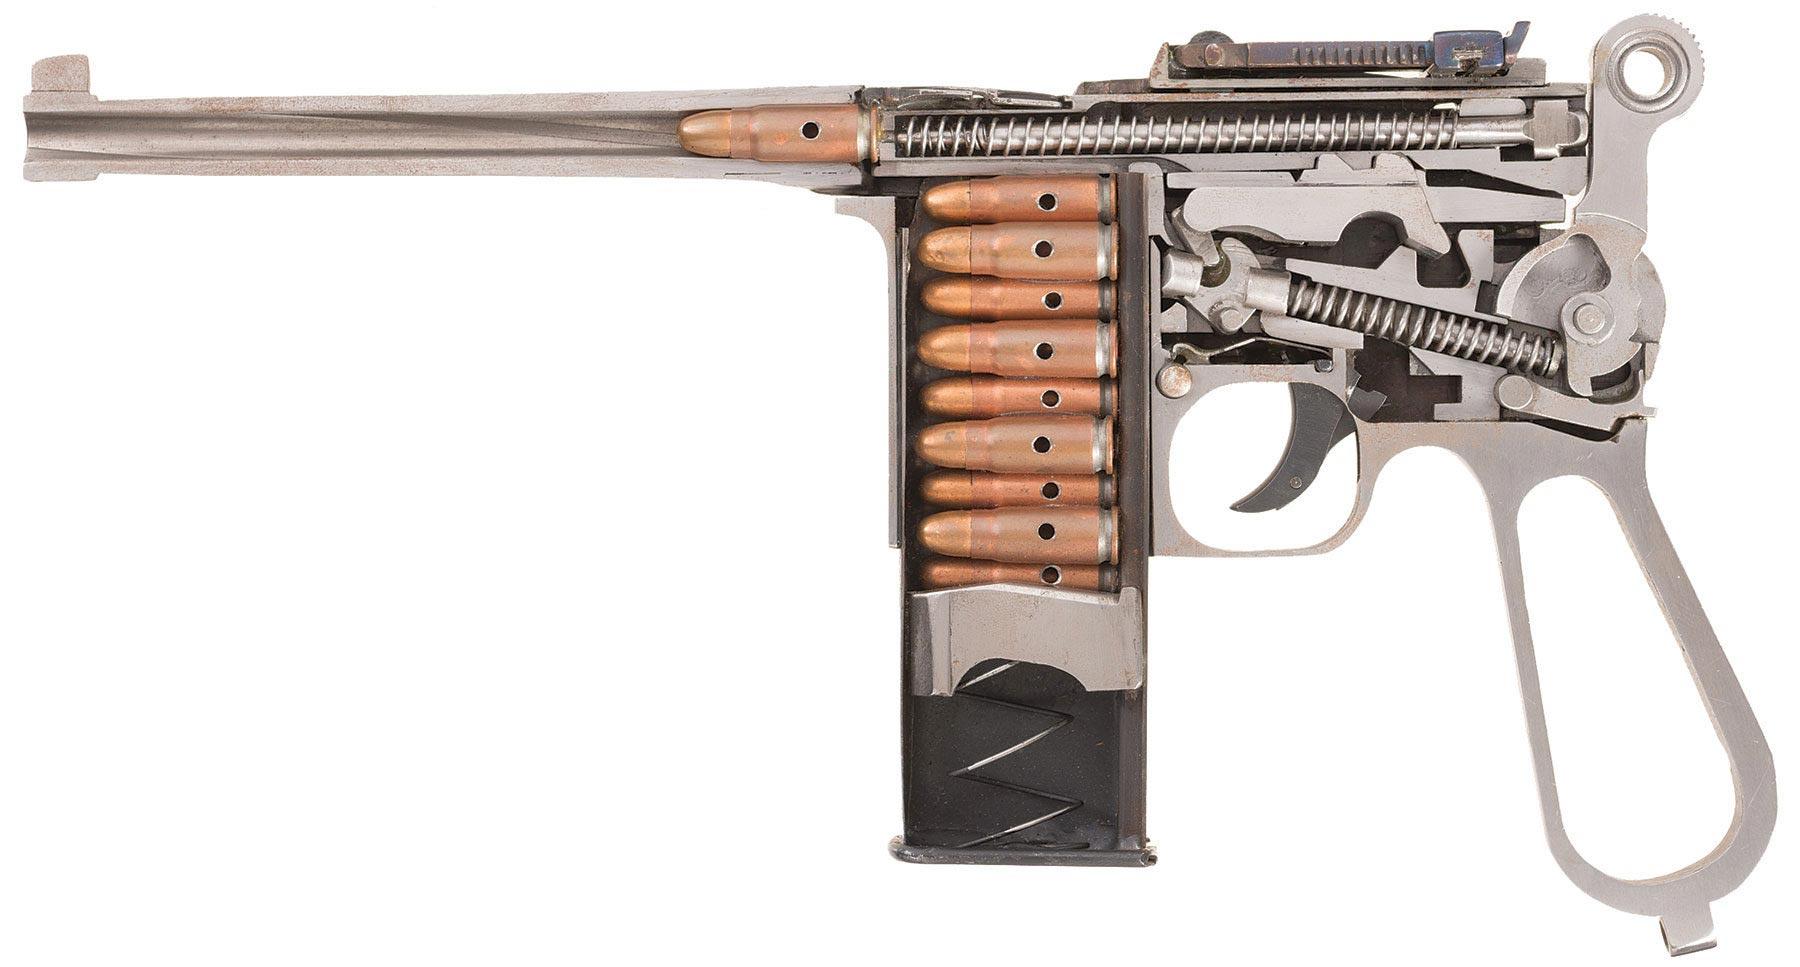 Mauser C96 cutaway